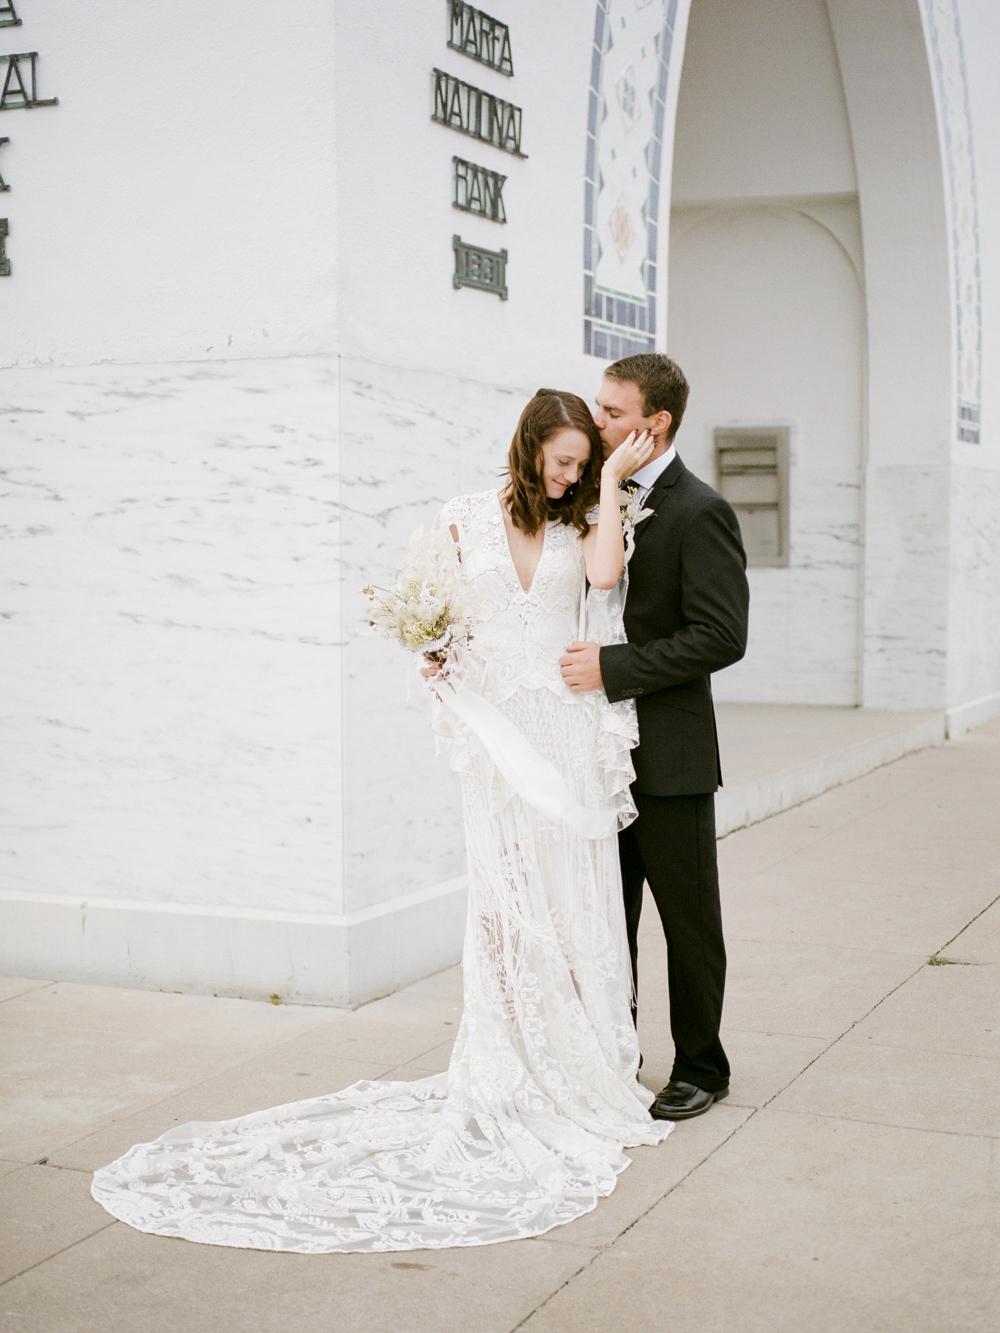 Christine Gosch - destination film photographer - houston wedding photographer - fine art film photographer - elopement photographer - destination wedding - understated wedding - simple beautiful wedding photography-87.jpg